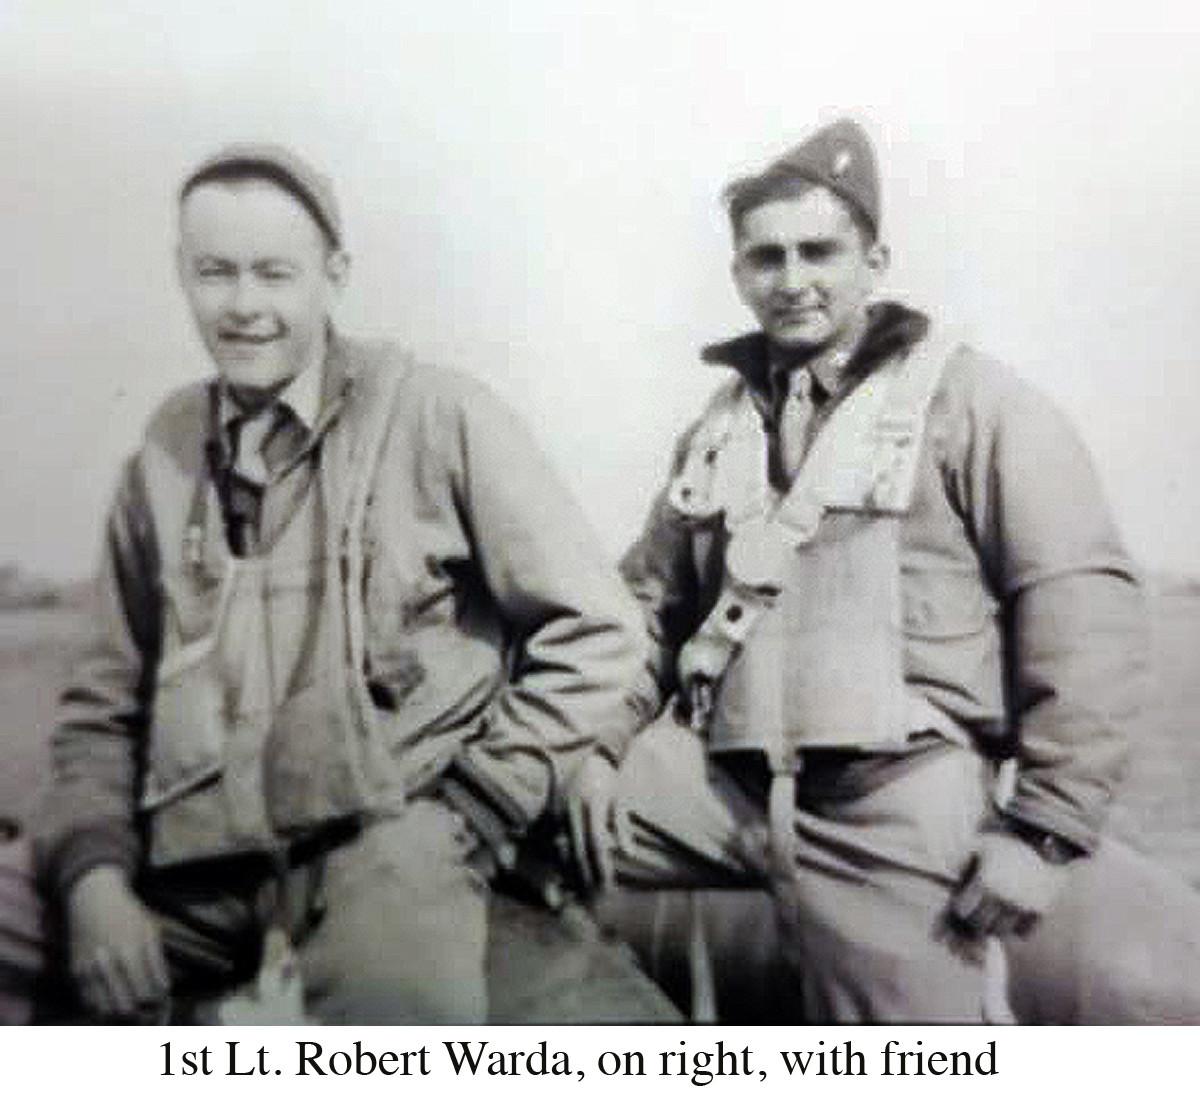 1st Lt. Robert Warda with friend copy